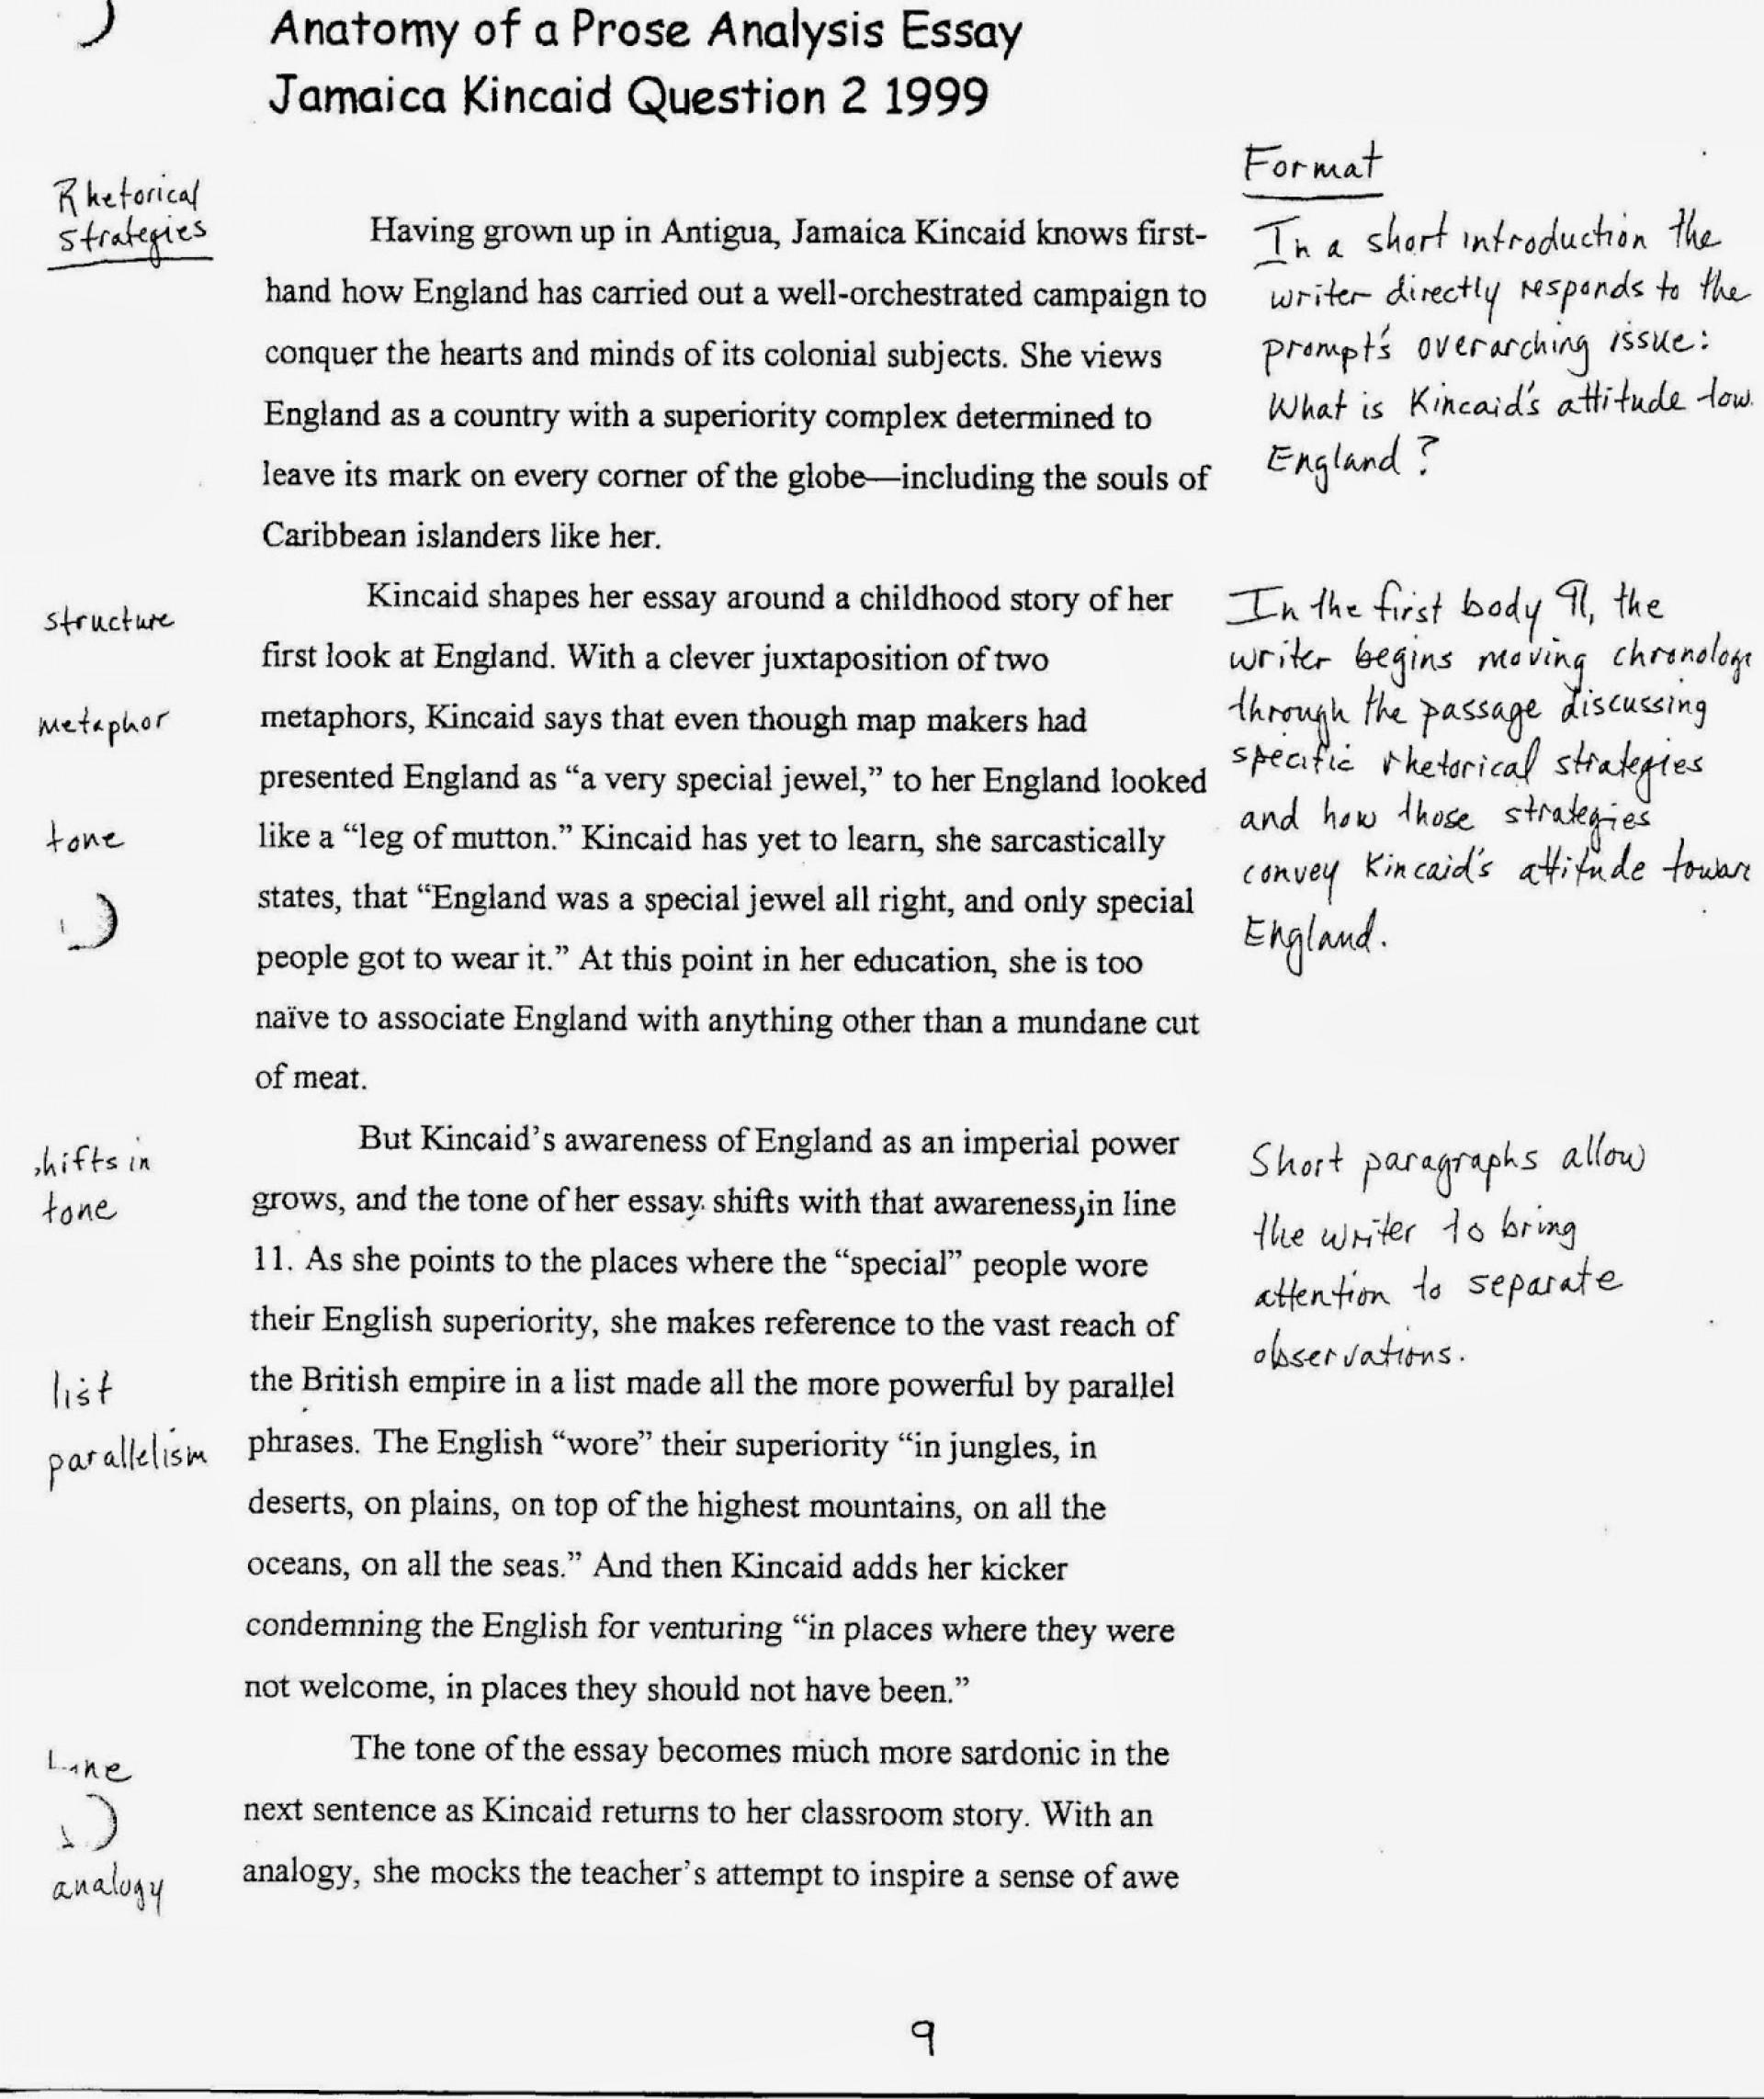 004 Essay Example Rhetorical Examples Of Analysis Essays Goal Blockety Co Using Ethos Pathos And Logo Logos Impressive Ap Lang 2016 Devices English 1920